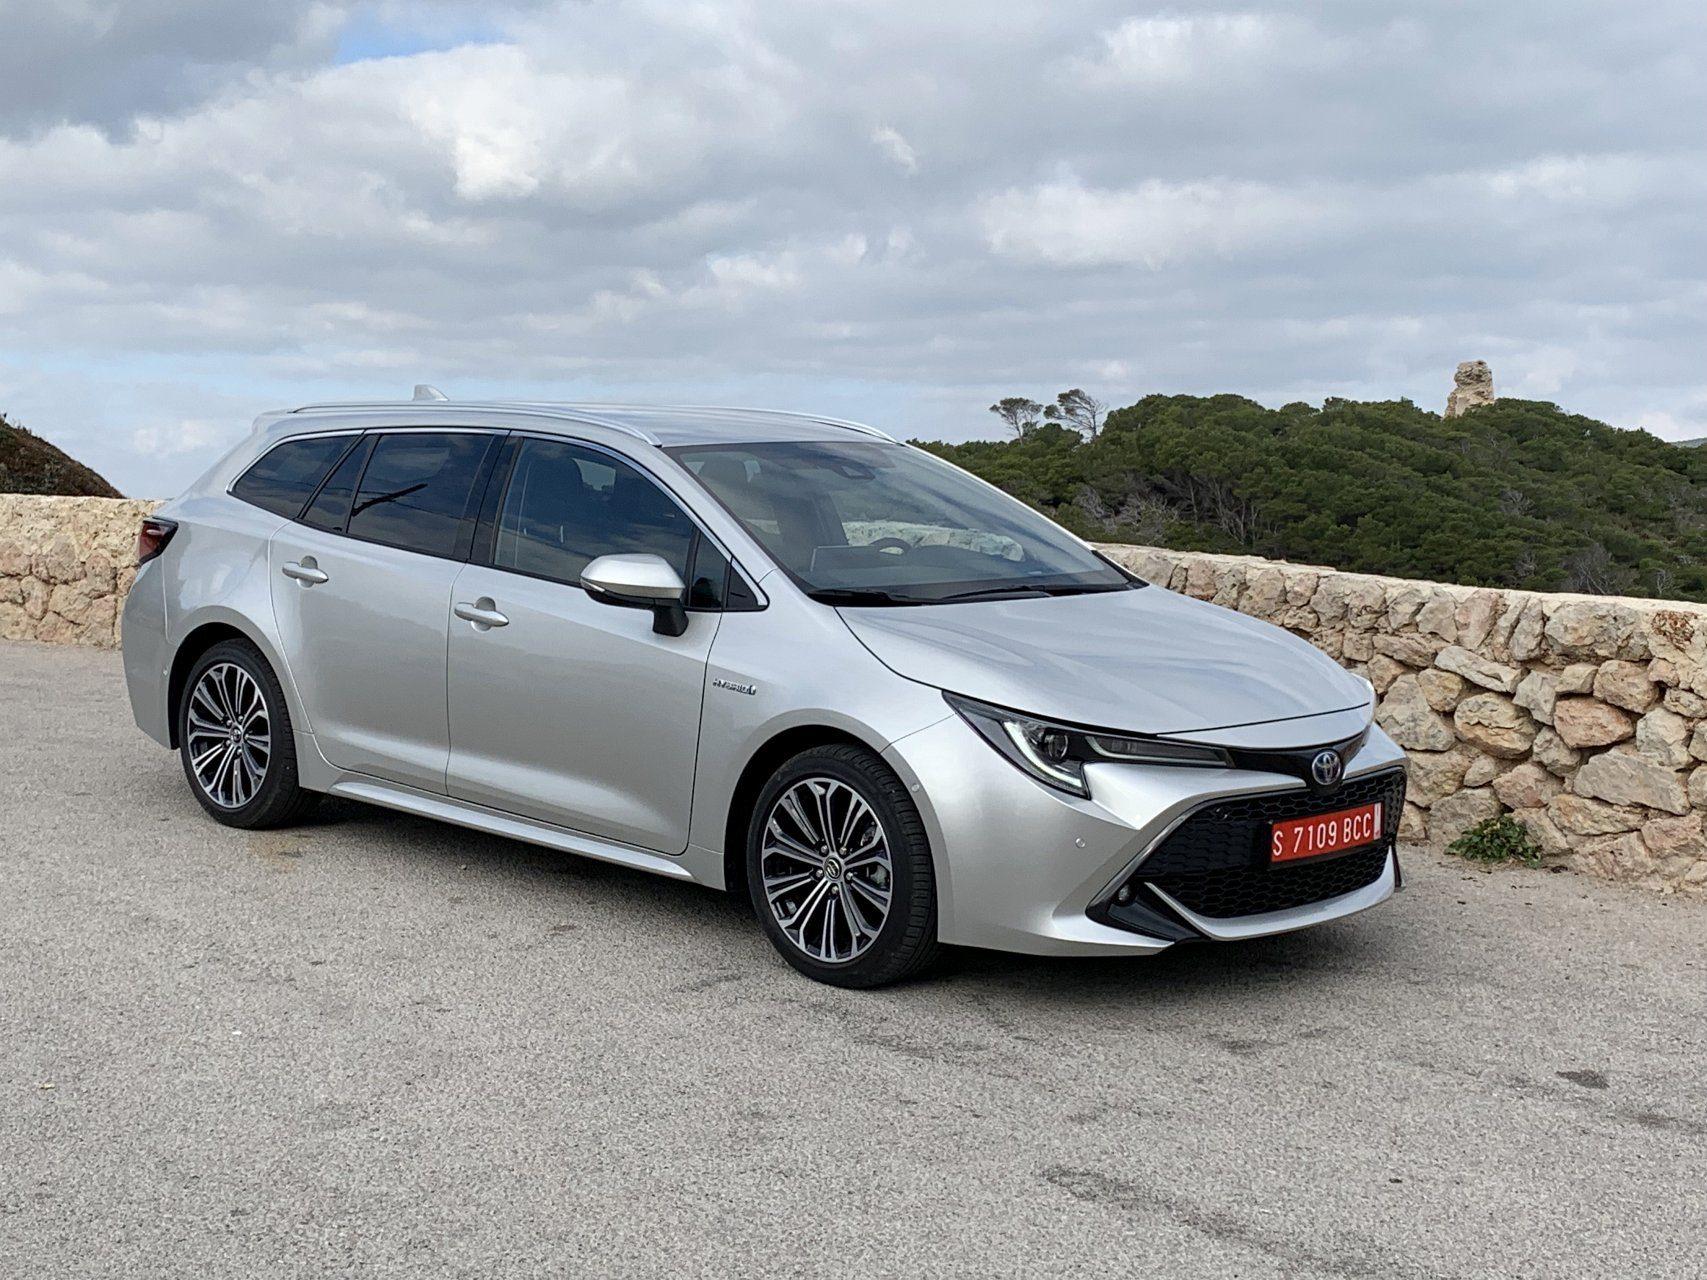 Toyota Corolla универсал